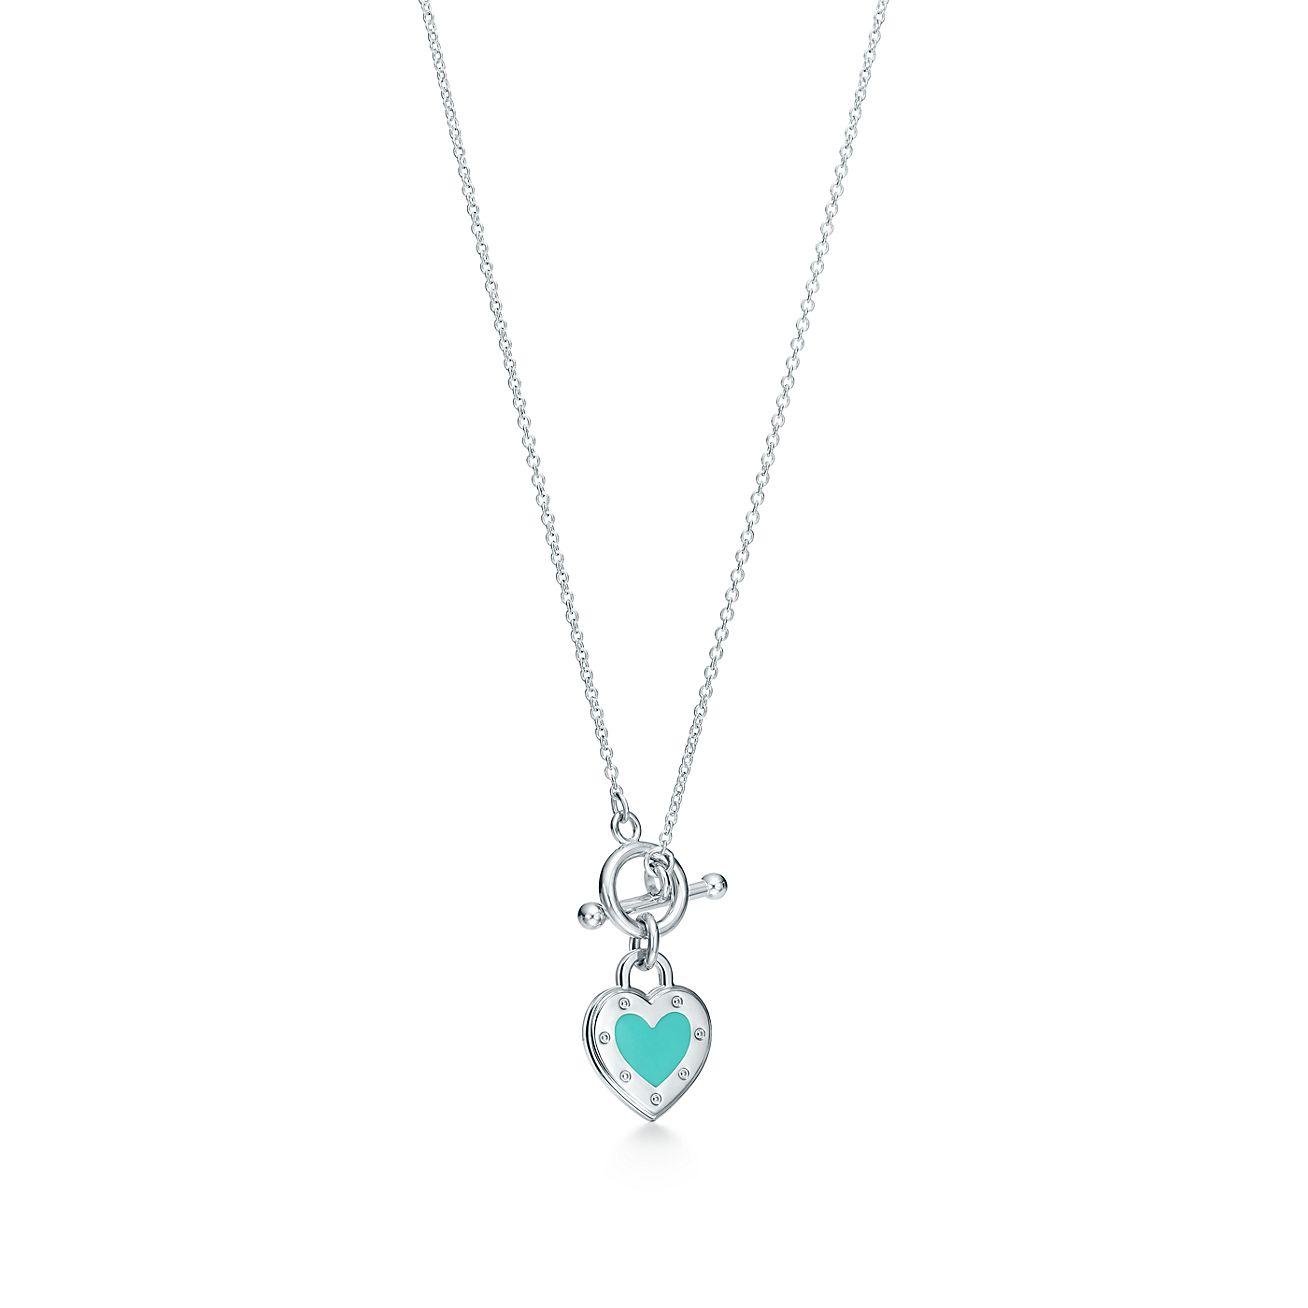 Return to Tiffany Love heart bead bracelet in silver with enamel finish - Size Medium Tiffany & Co. TnMuRQAE5Q